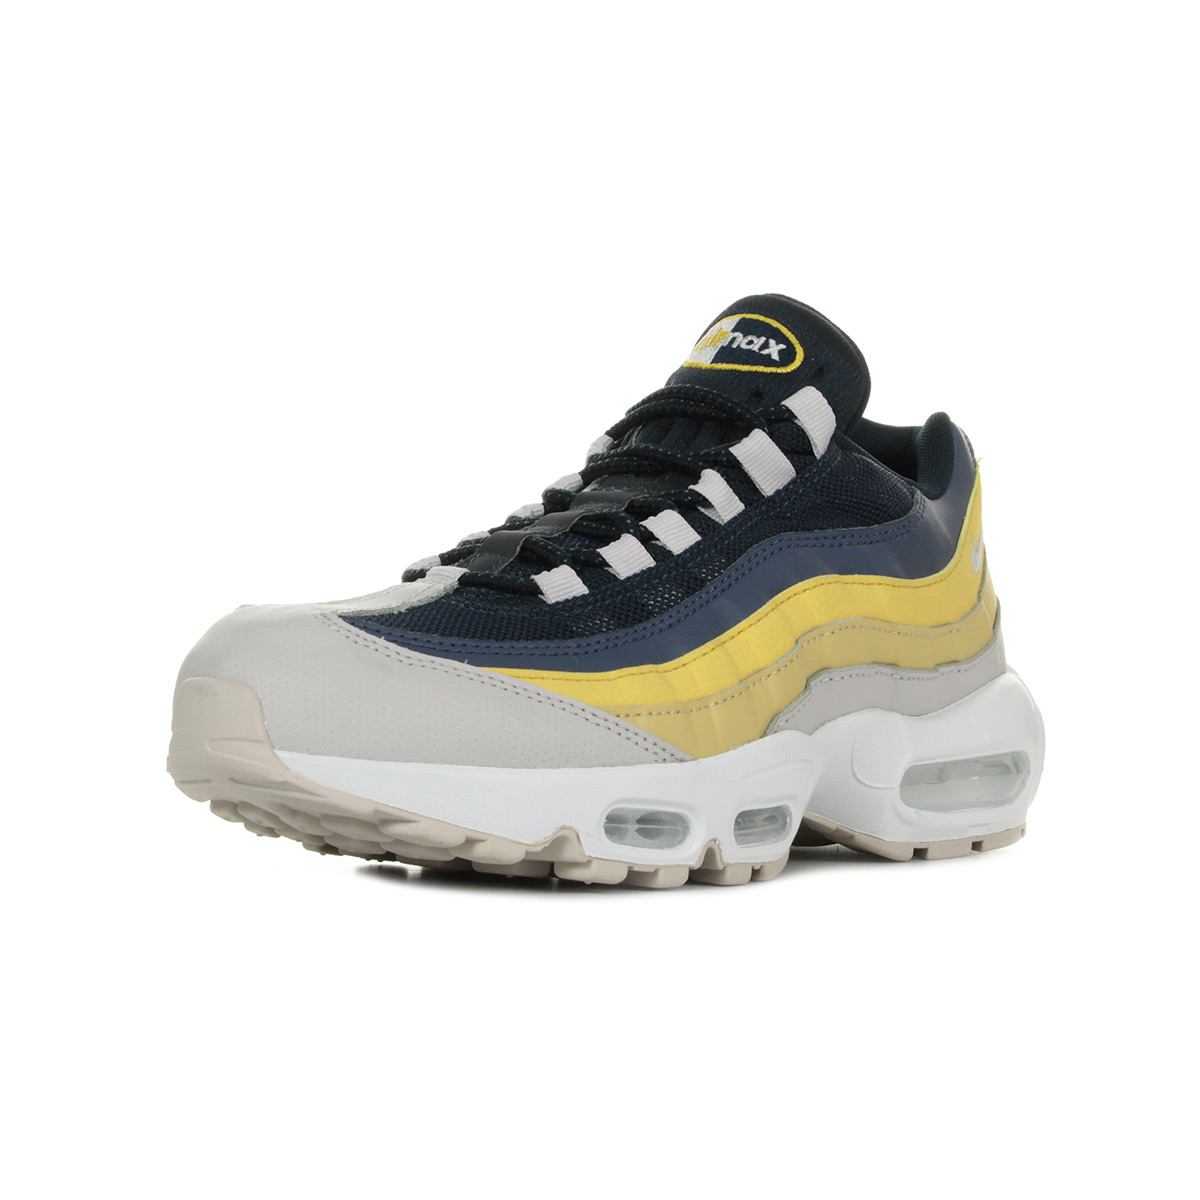 timeless design b4fa3 da01d Nike Air Max 95 Essential ...